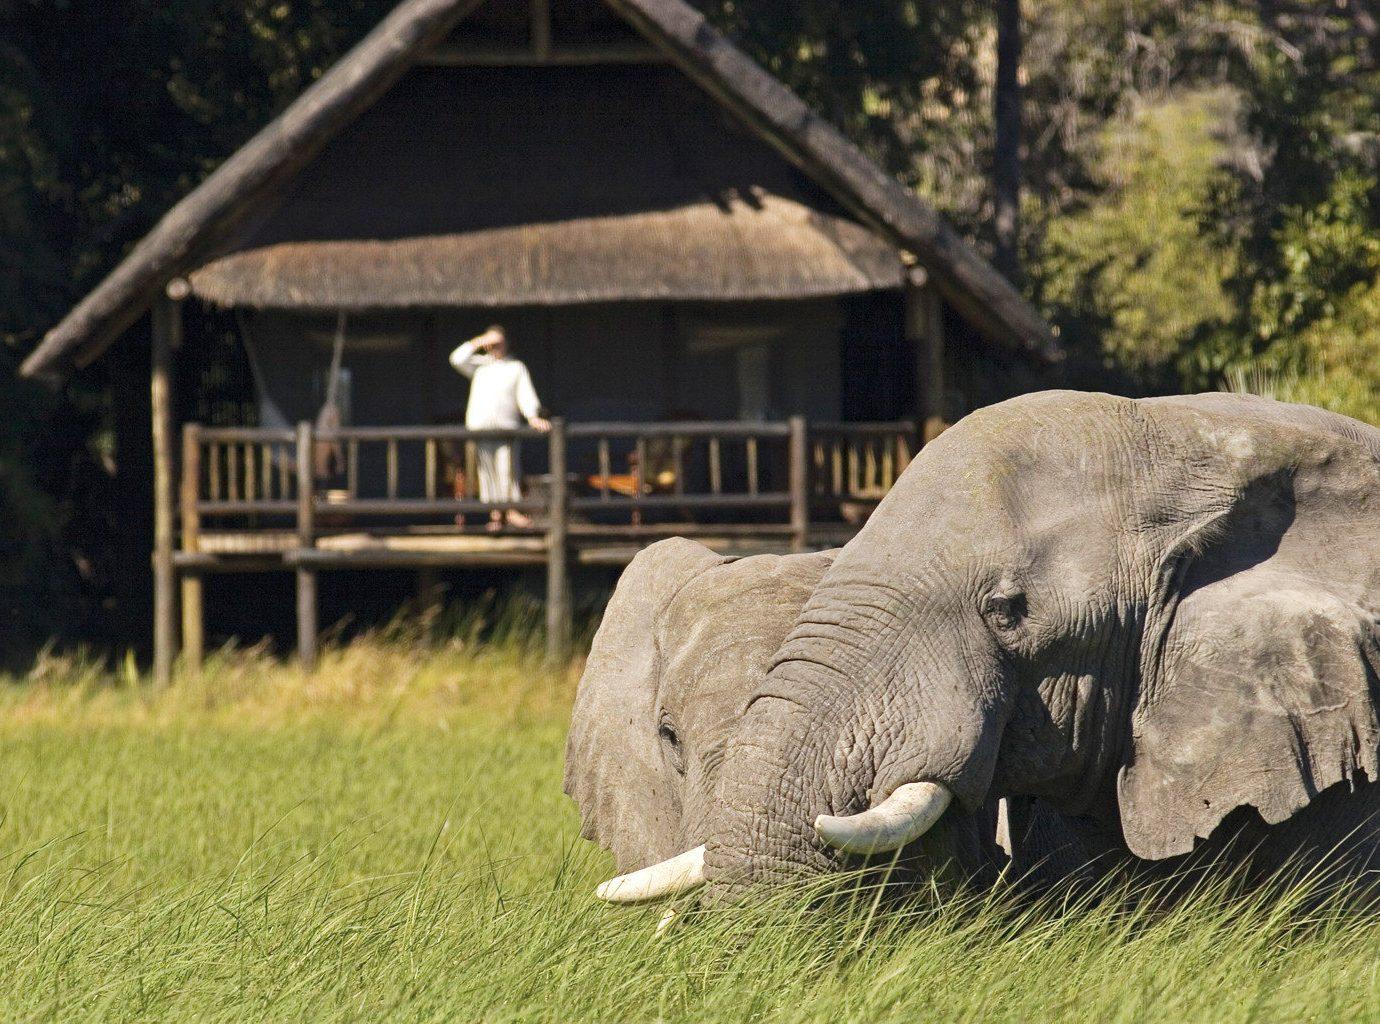 Jungle Lodge Natural wonders Outdoor Activities Outdoors Safari Scenic views grass tree animal elephant mammal indian elephant field Wildlife fauna elephants and mammoths zoo Adventure recreation trunk